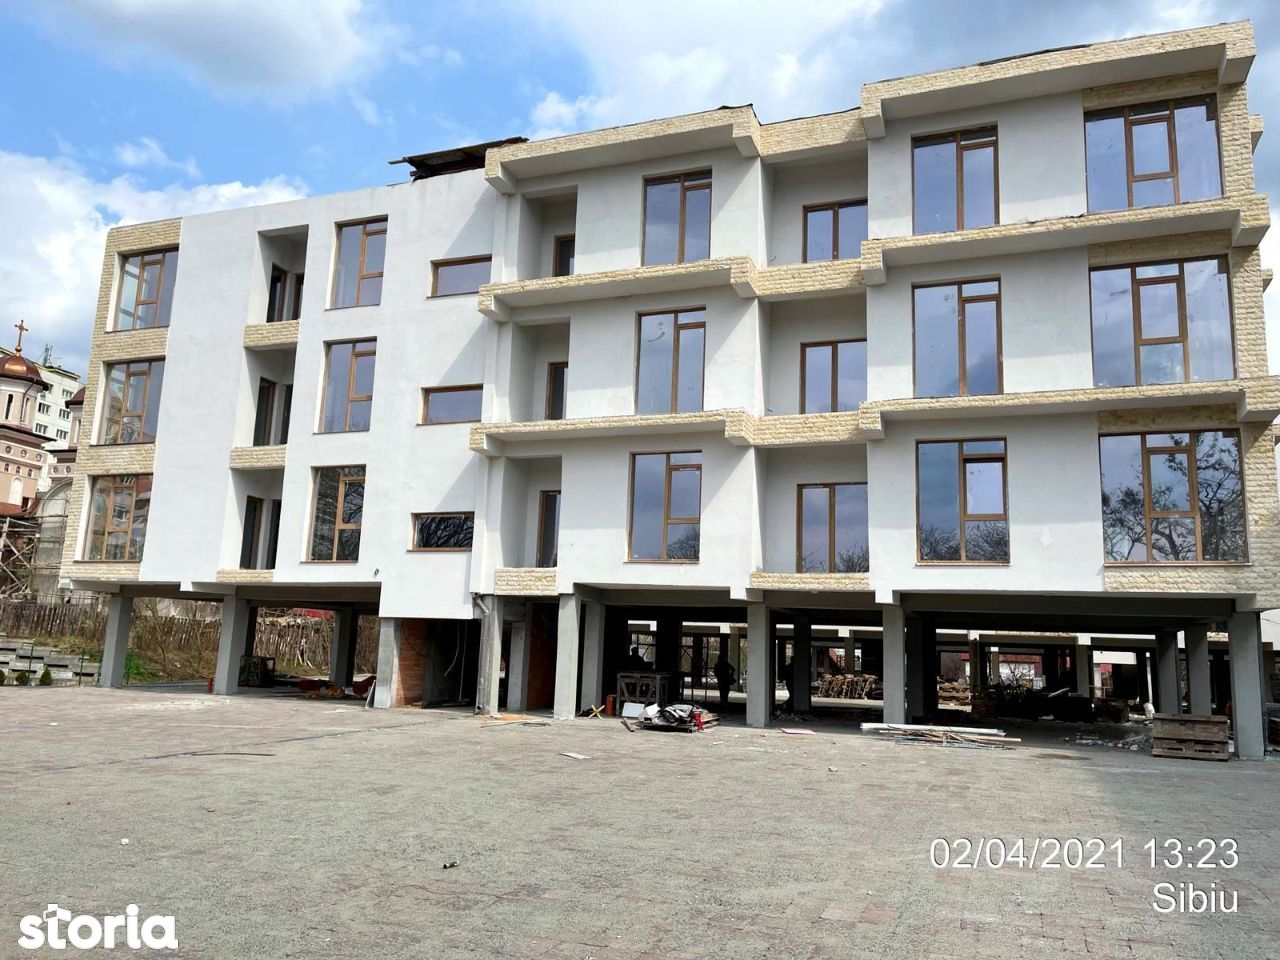 Etaj 2 Apartament 2 camere+ parcare McDonald's in spate la El Gringo